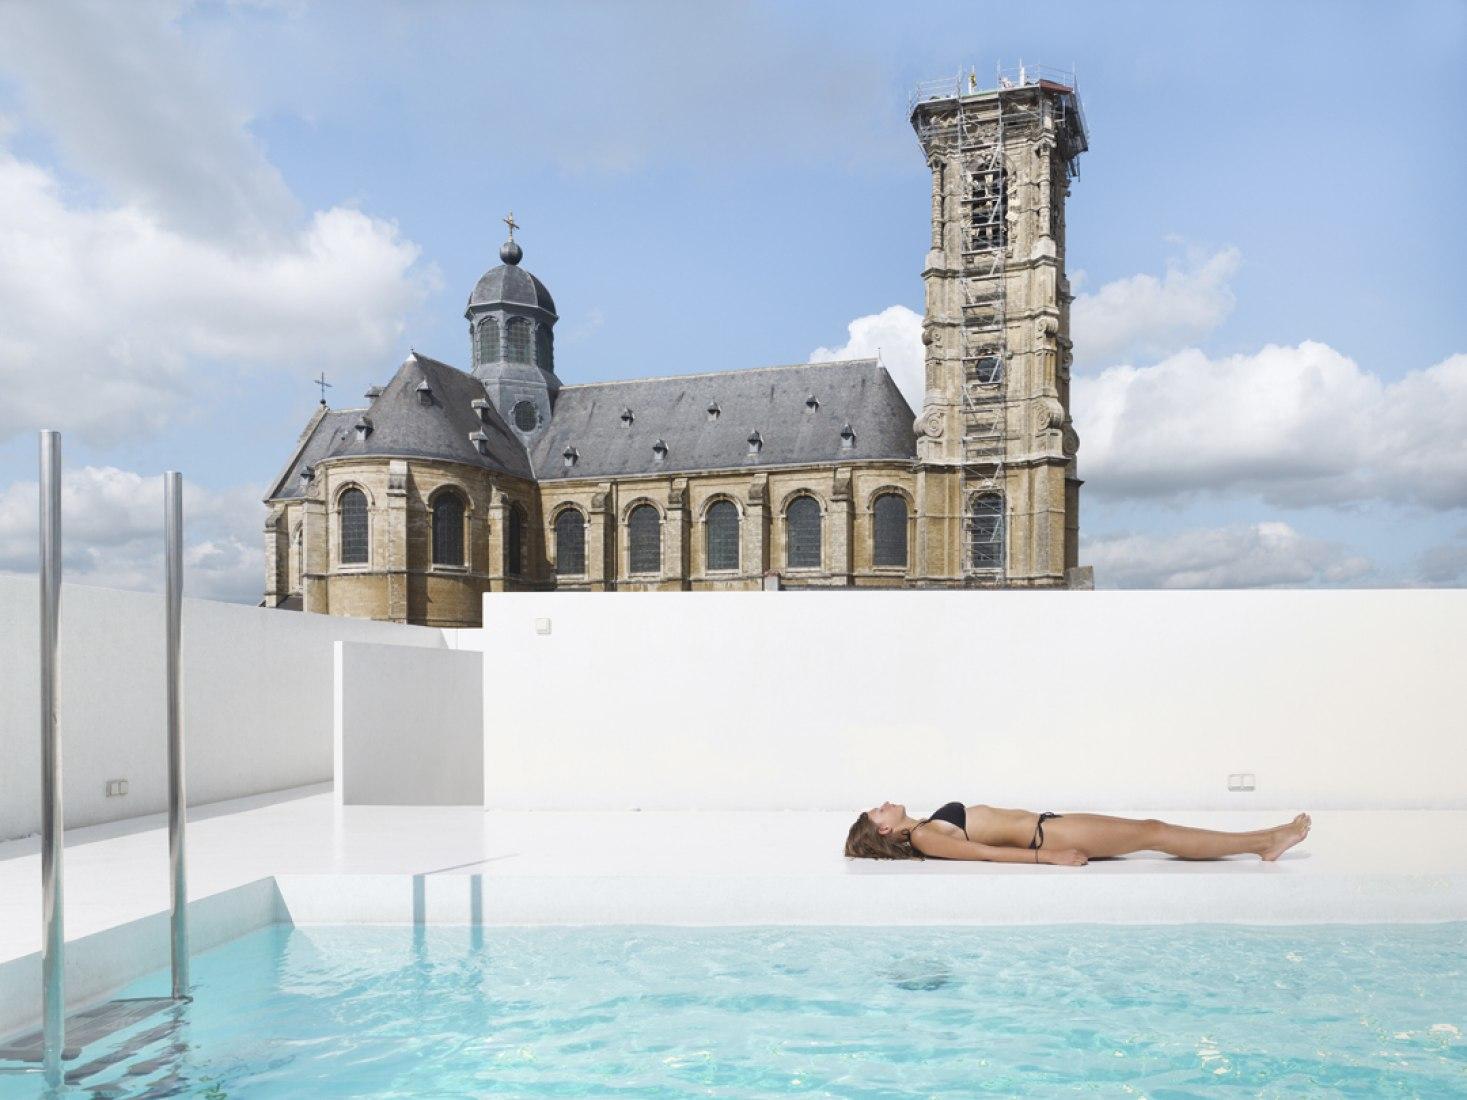 Swimming pool K by dmvA. Photography © Frederik Vercruysse.